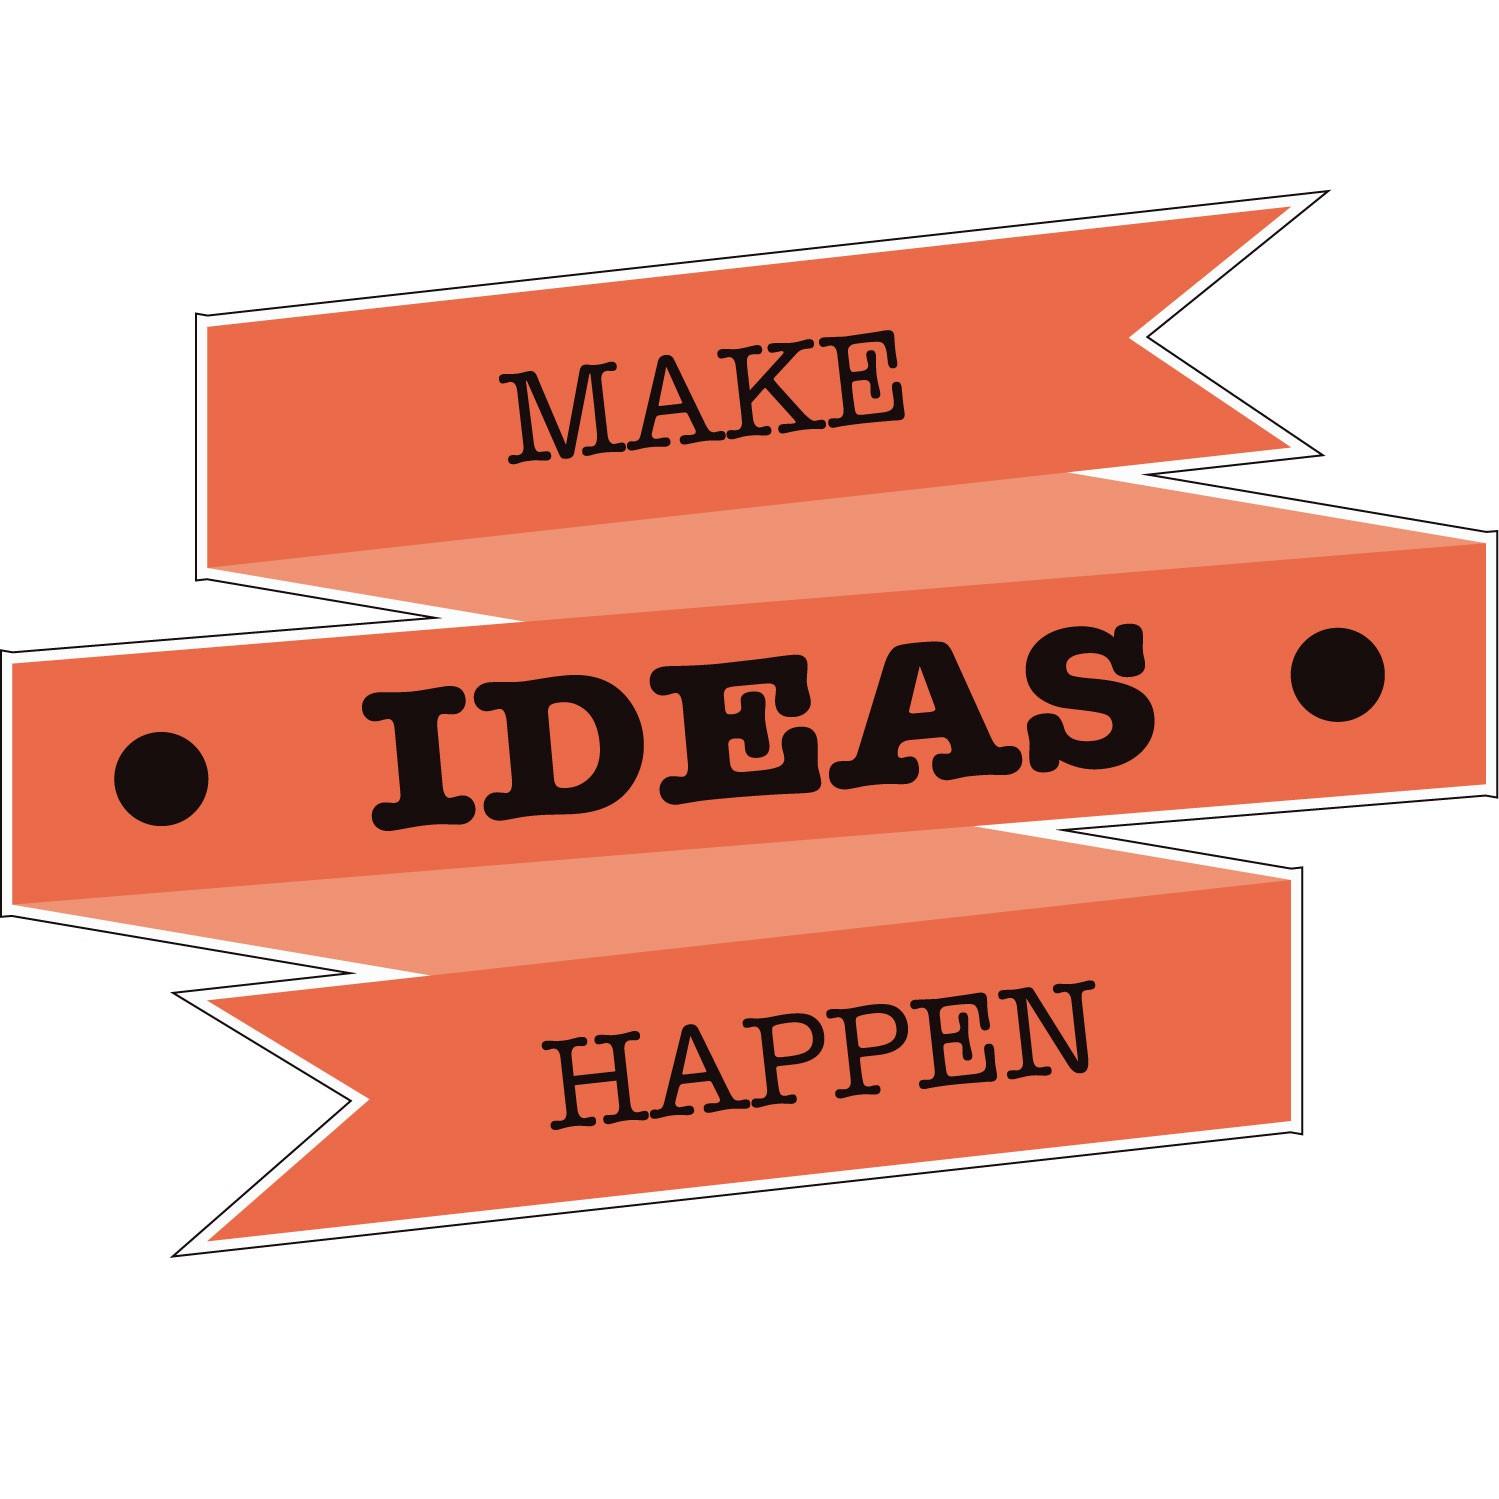 Adesivo de Parede Make Ideas Happen Laranja